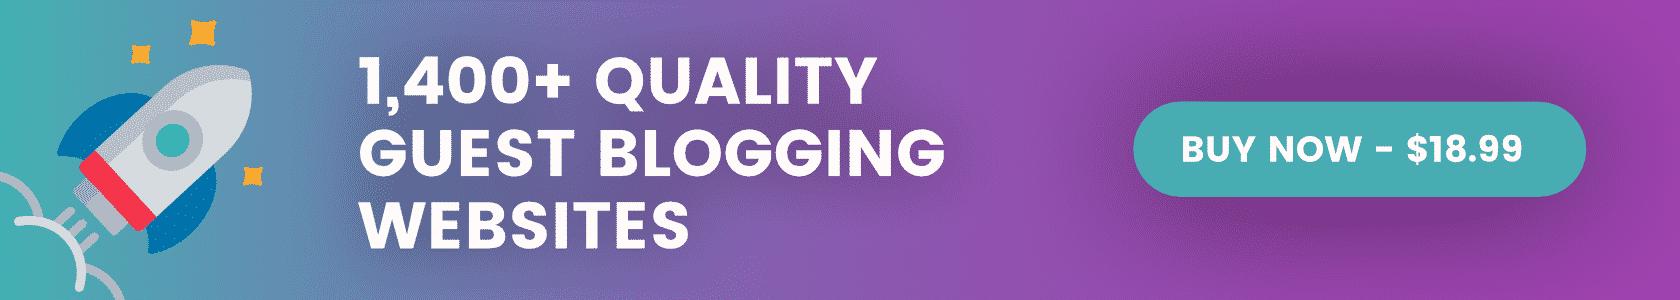 1,400+ Quality Guest Blogging Websites